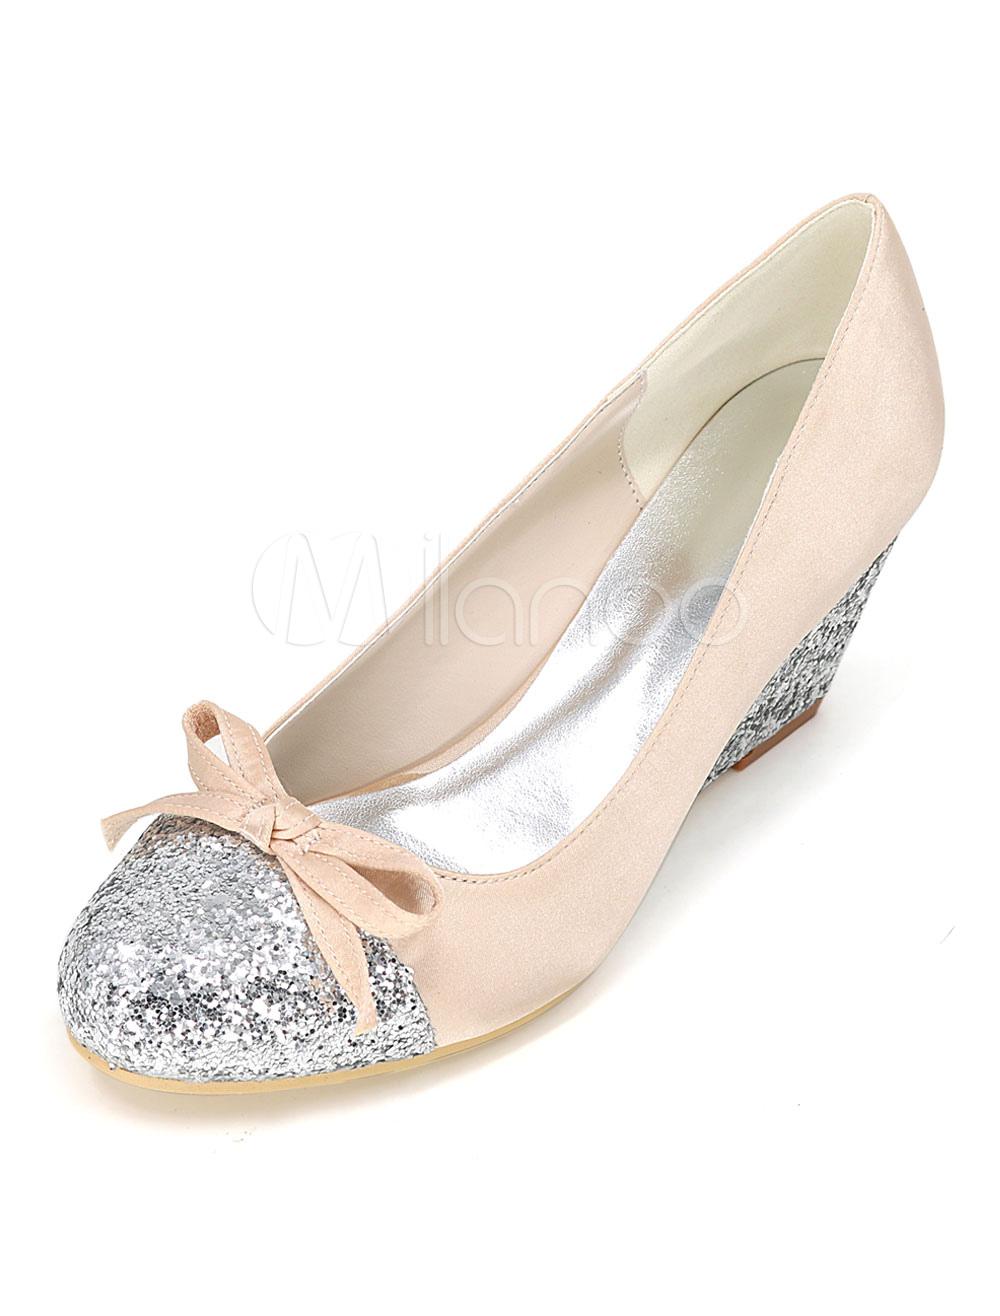 White Wedding Shoes Wedge Glitter Two Tone Bow Round Toe Slip On